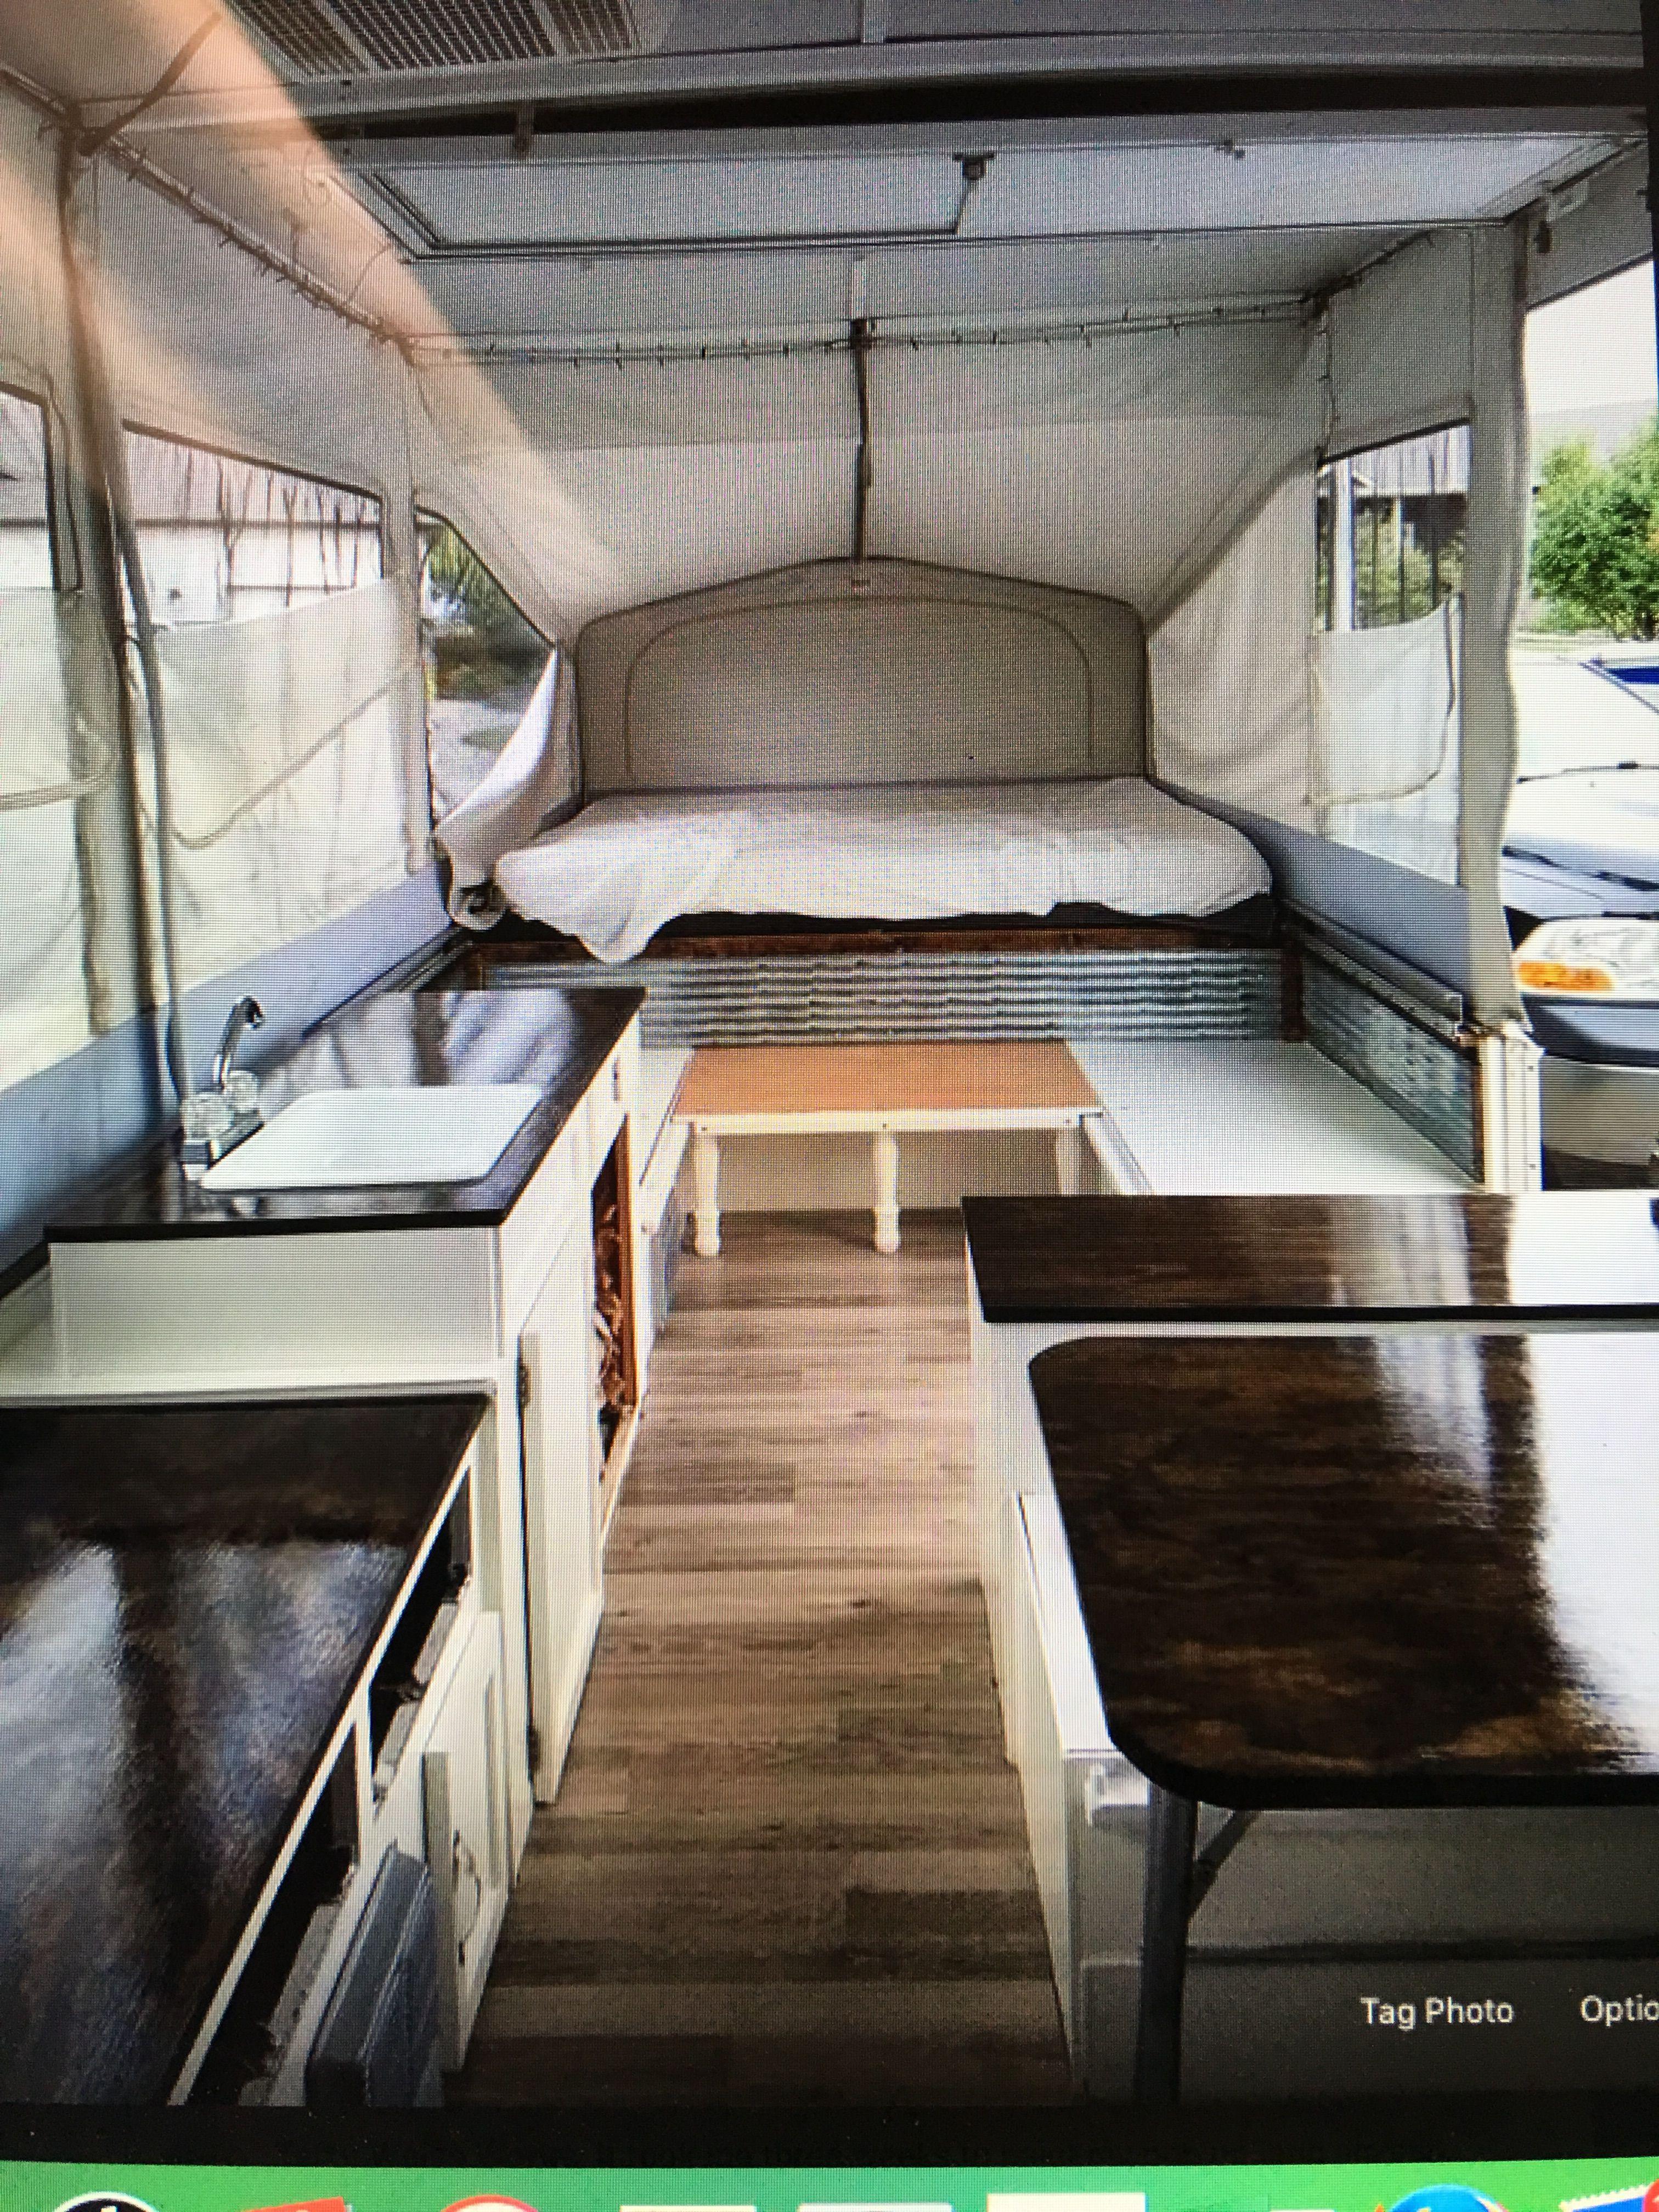 Love color | Outdoor life | Popup camper remodel, Diy camper